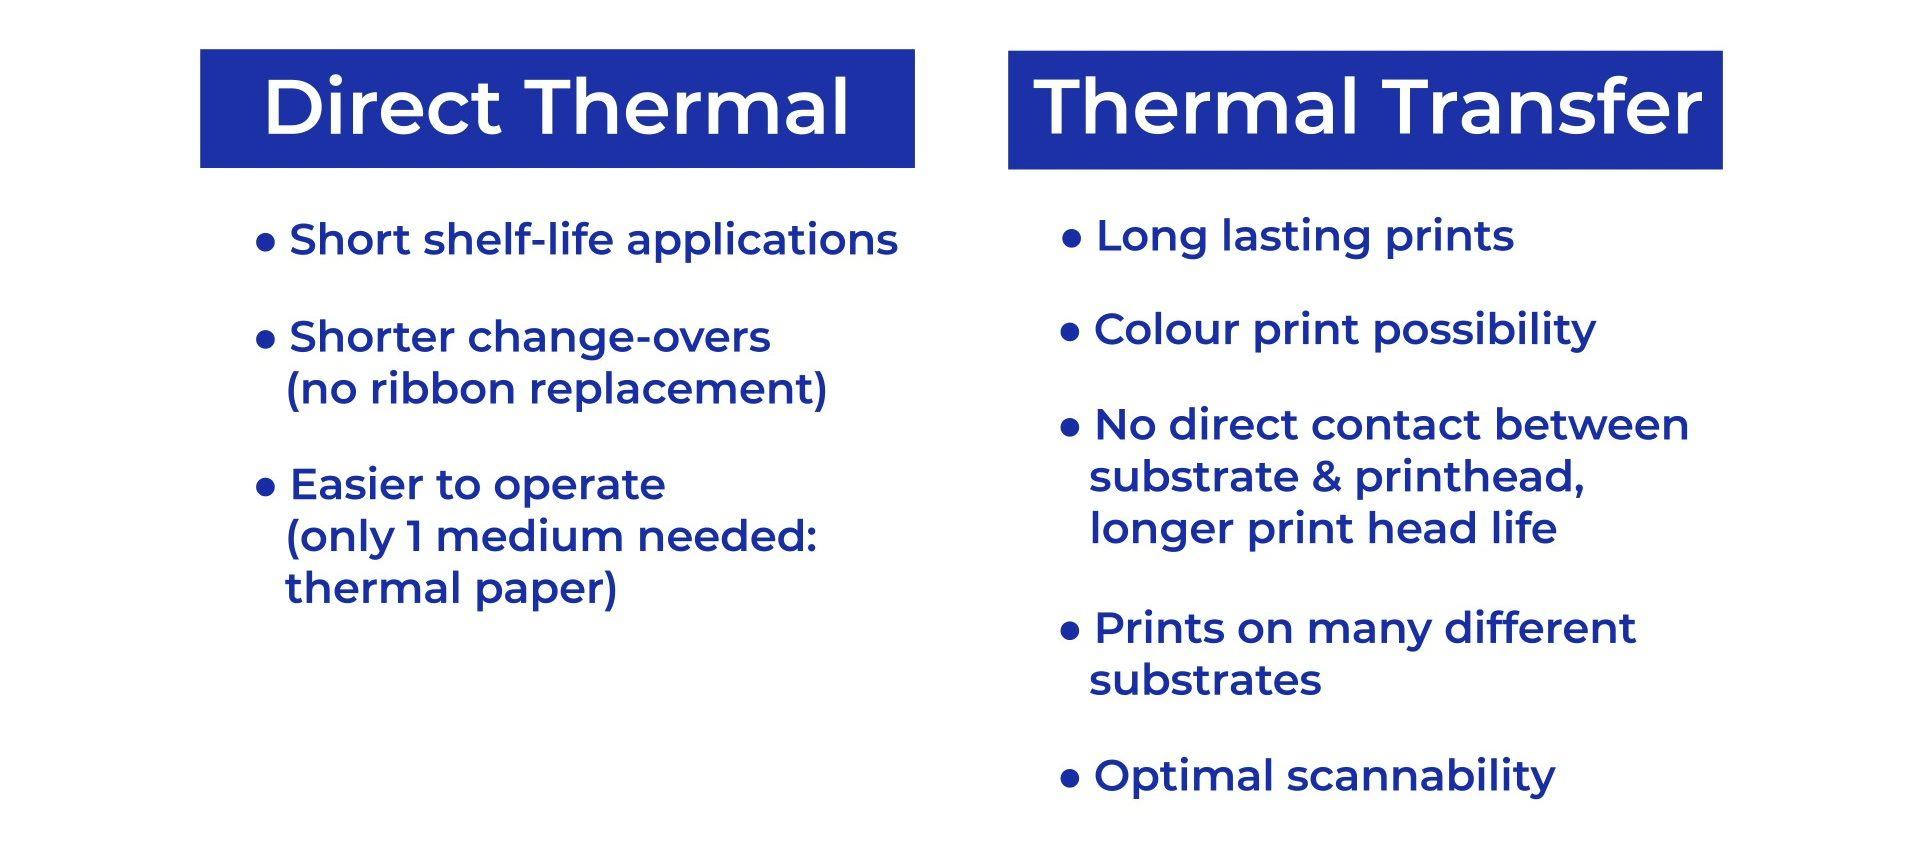 Thermal Transfer Printing vs Direct Transfer Printing Overview